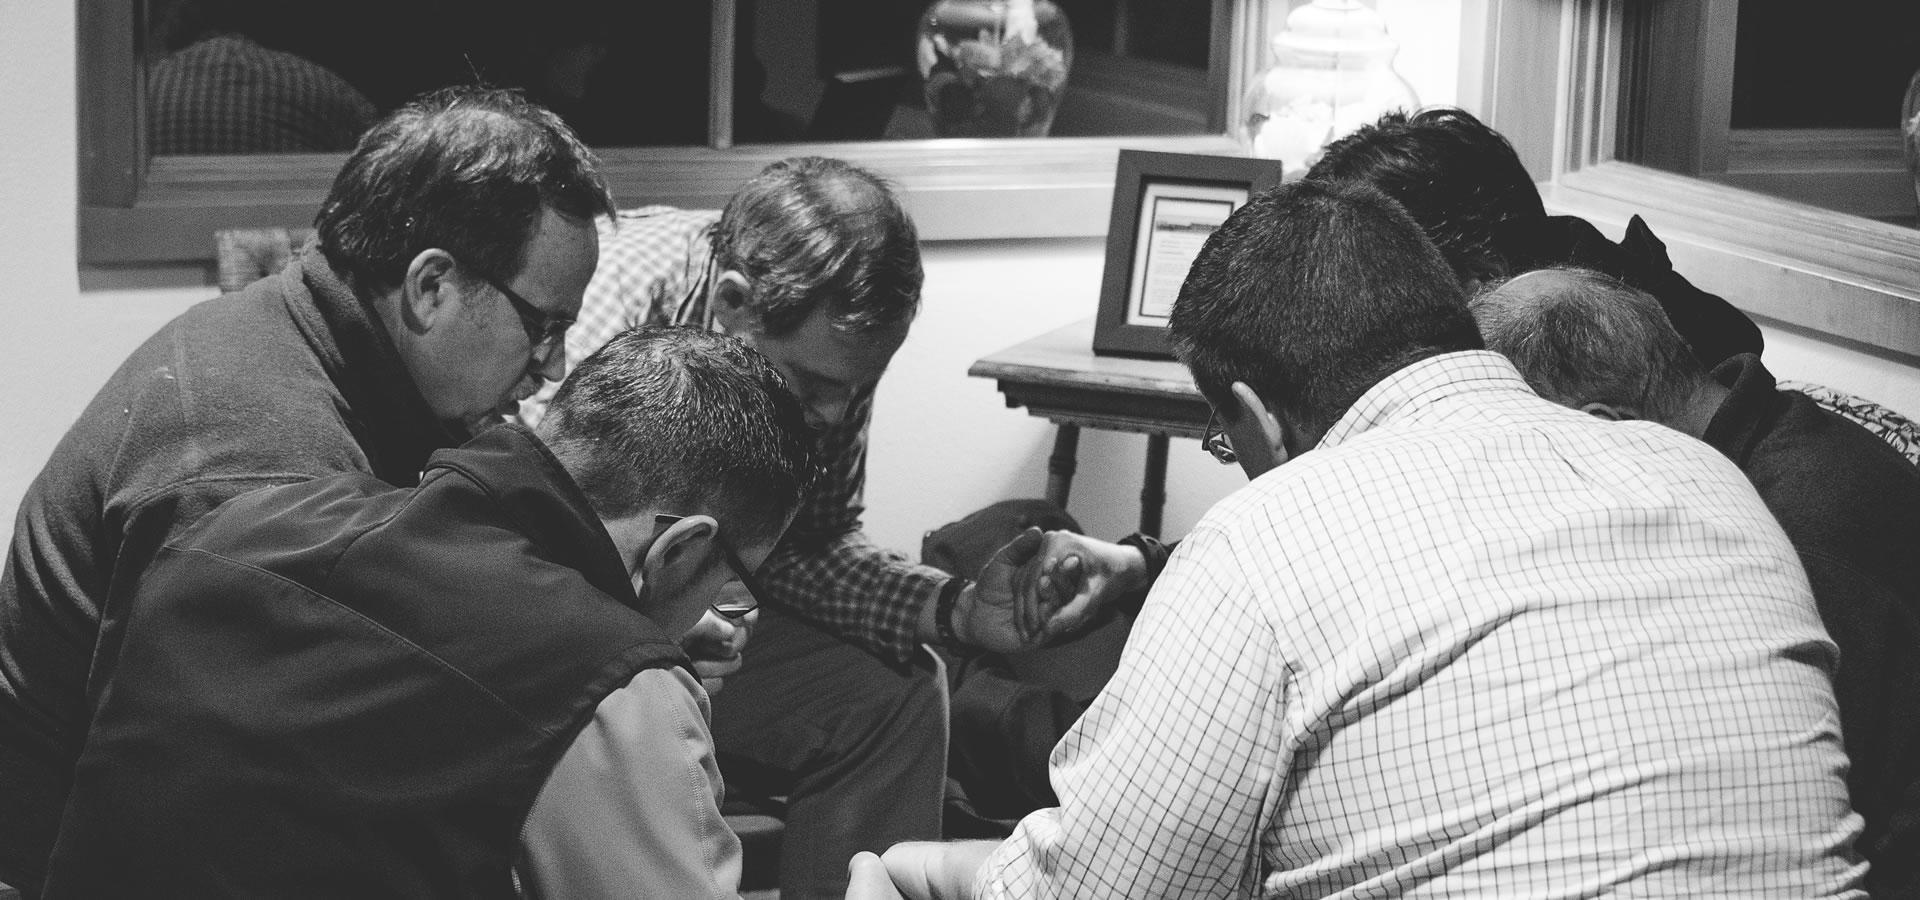 How To Pray - Prayer Online